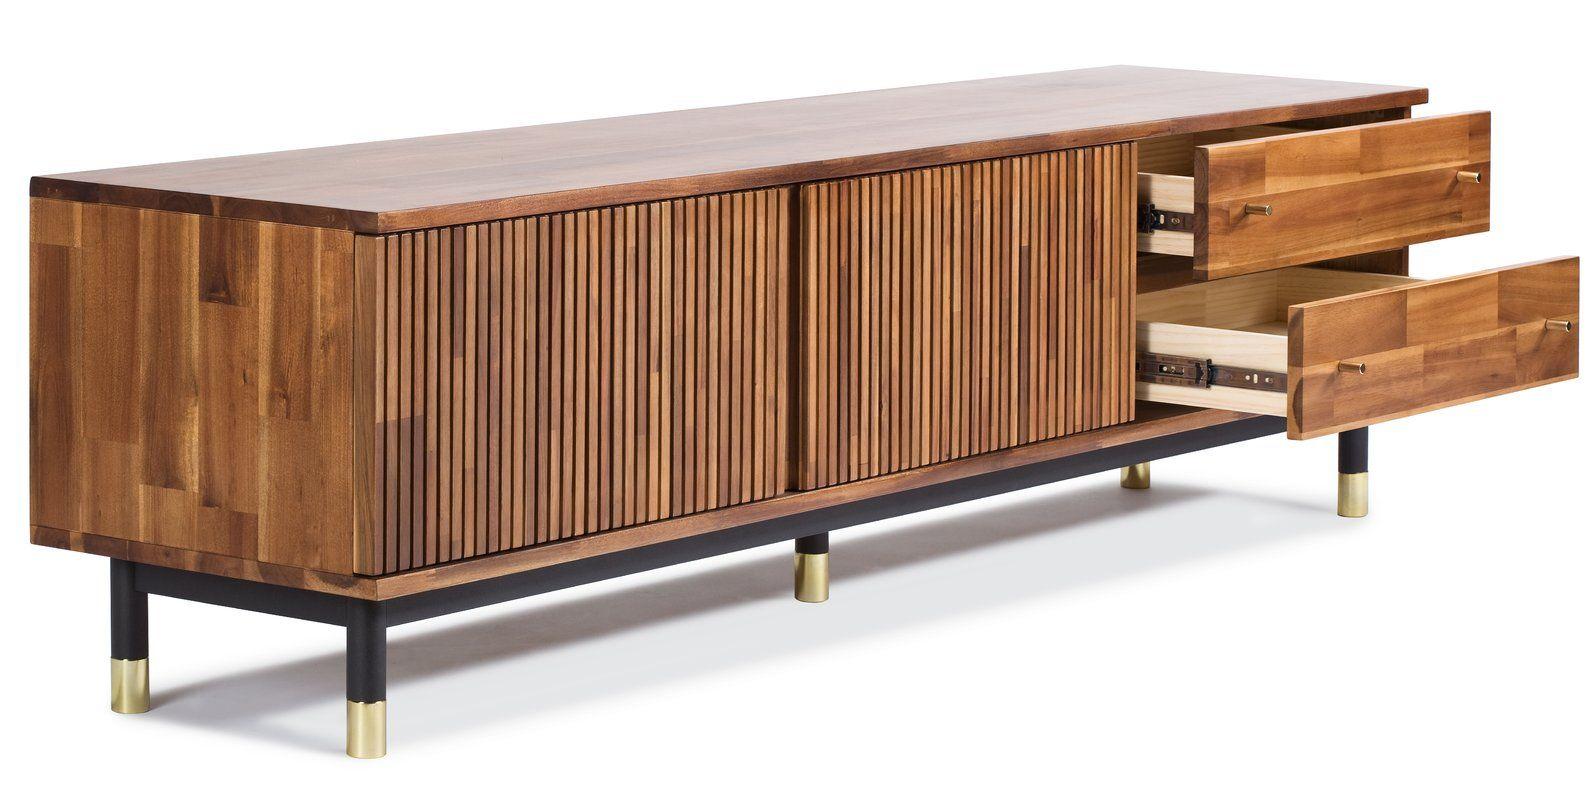 Manolla Tv Stand Allmodern Modern Furniture Living Room Furniture Tv Stand Wood Tv stand solid wood